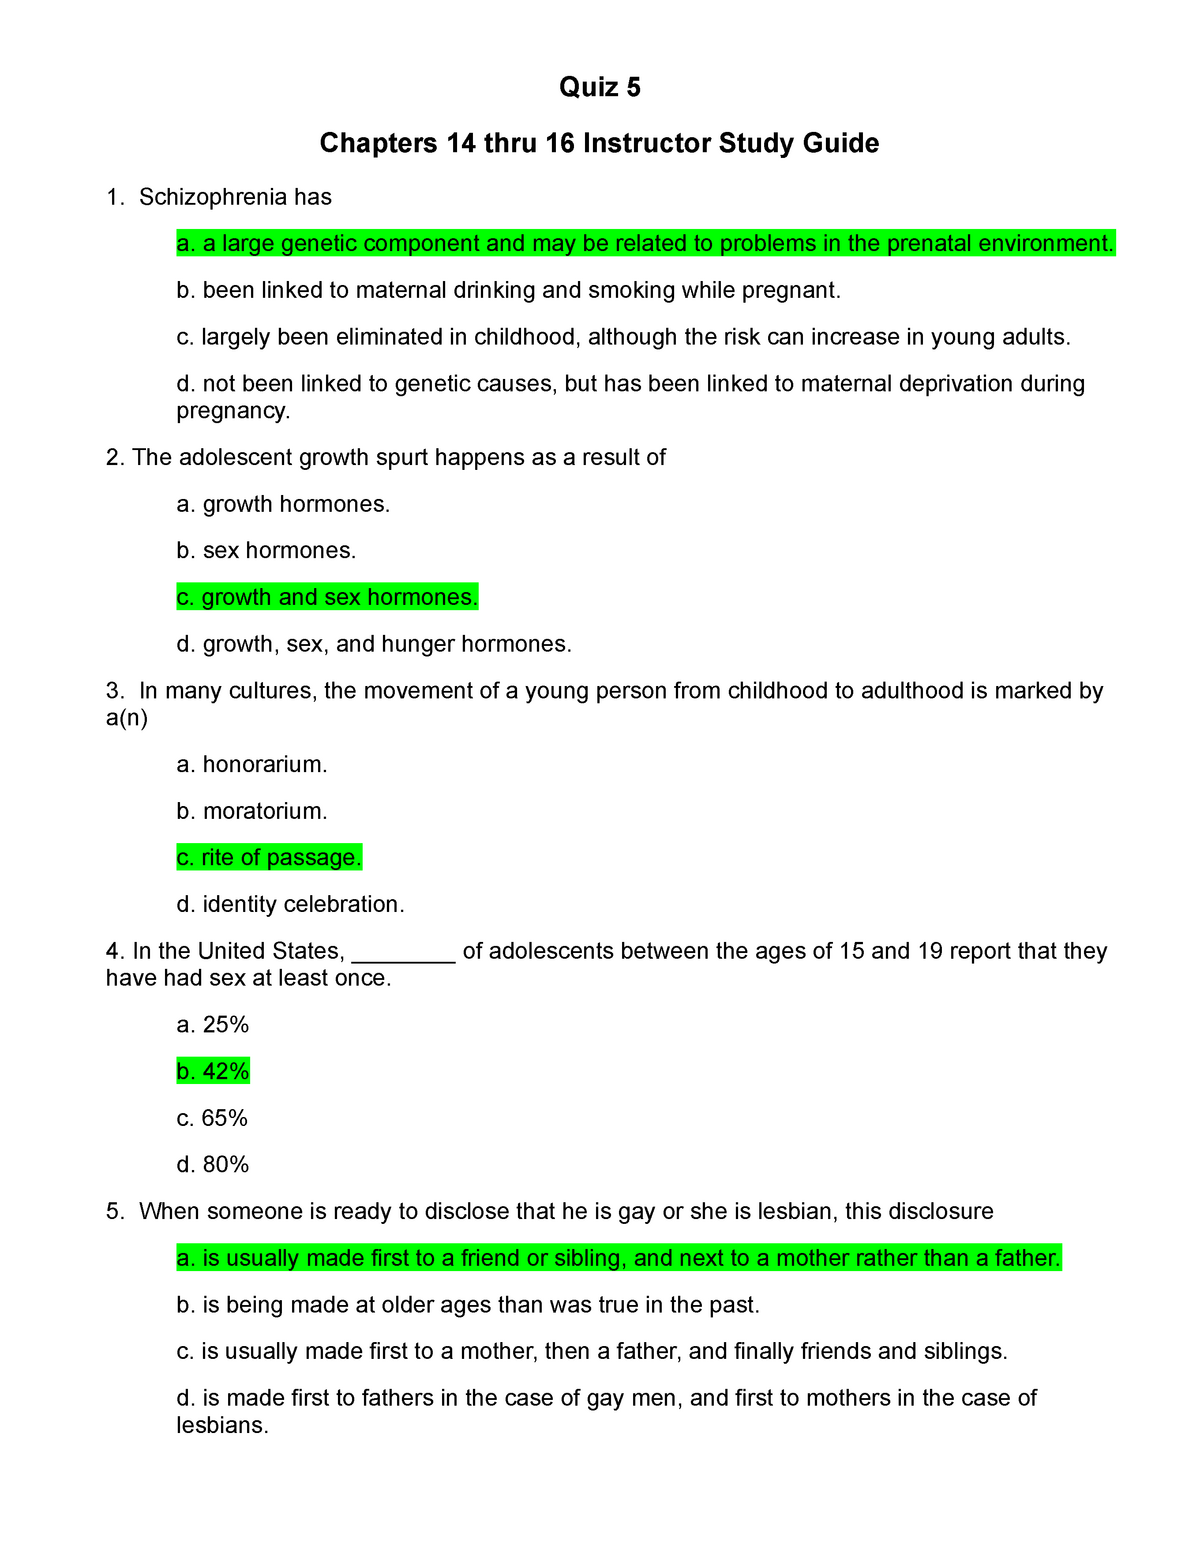 EPSY 202 Quiz 5 Chapters 14 thru 16 Study Guide - EPSY 202